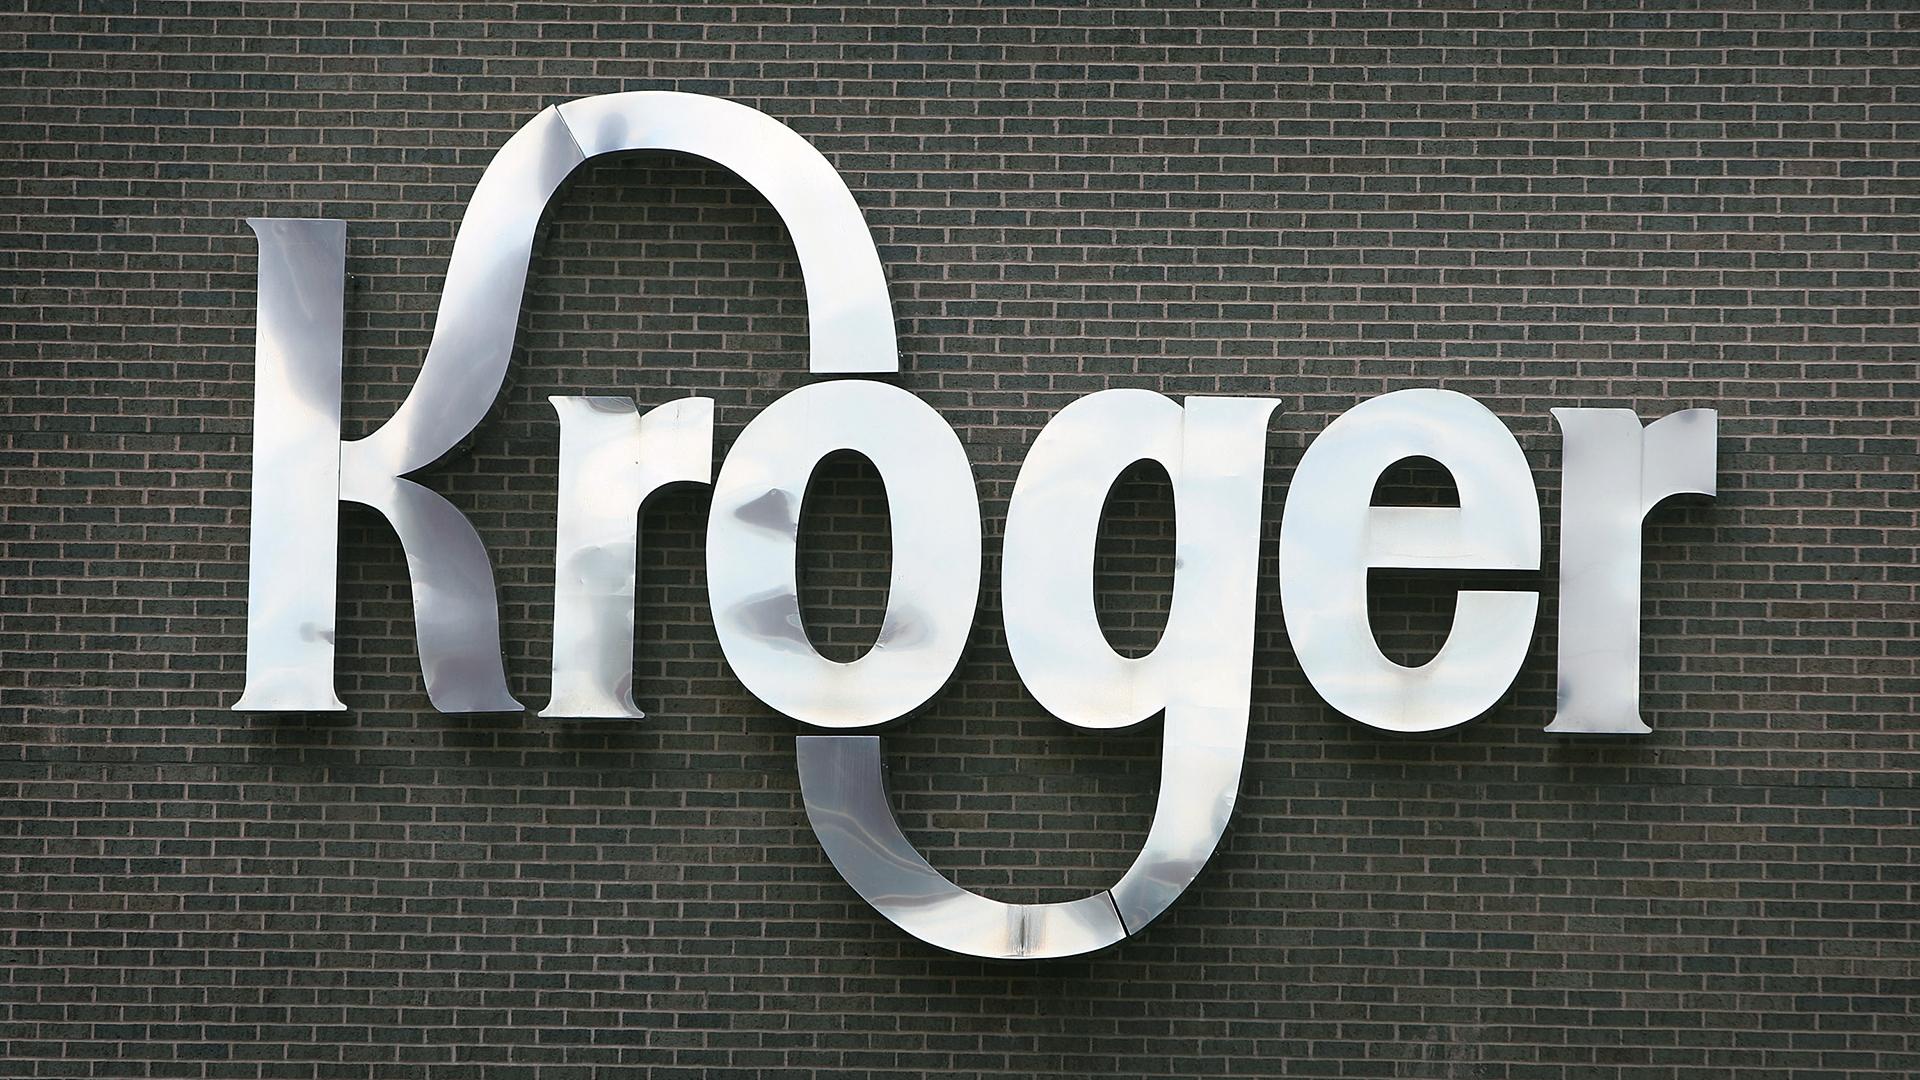 Kroger Headquarters Sign-159532.jpg61155861